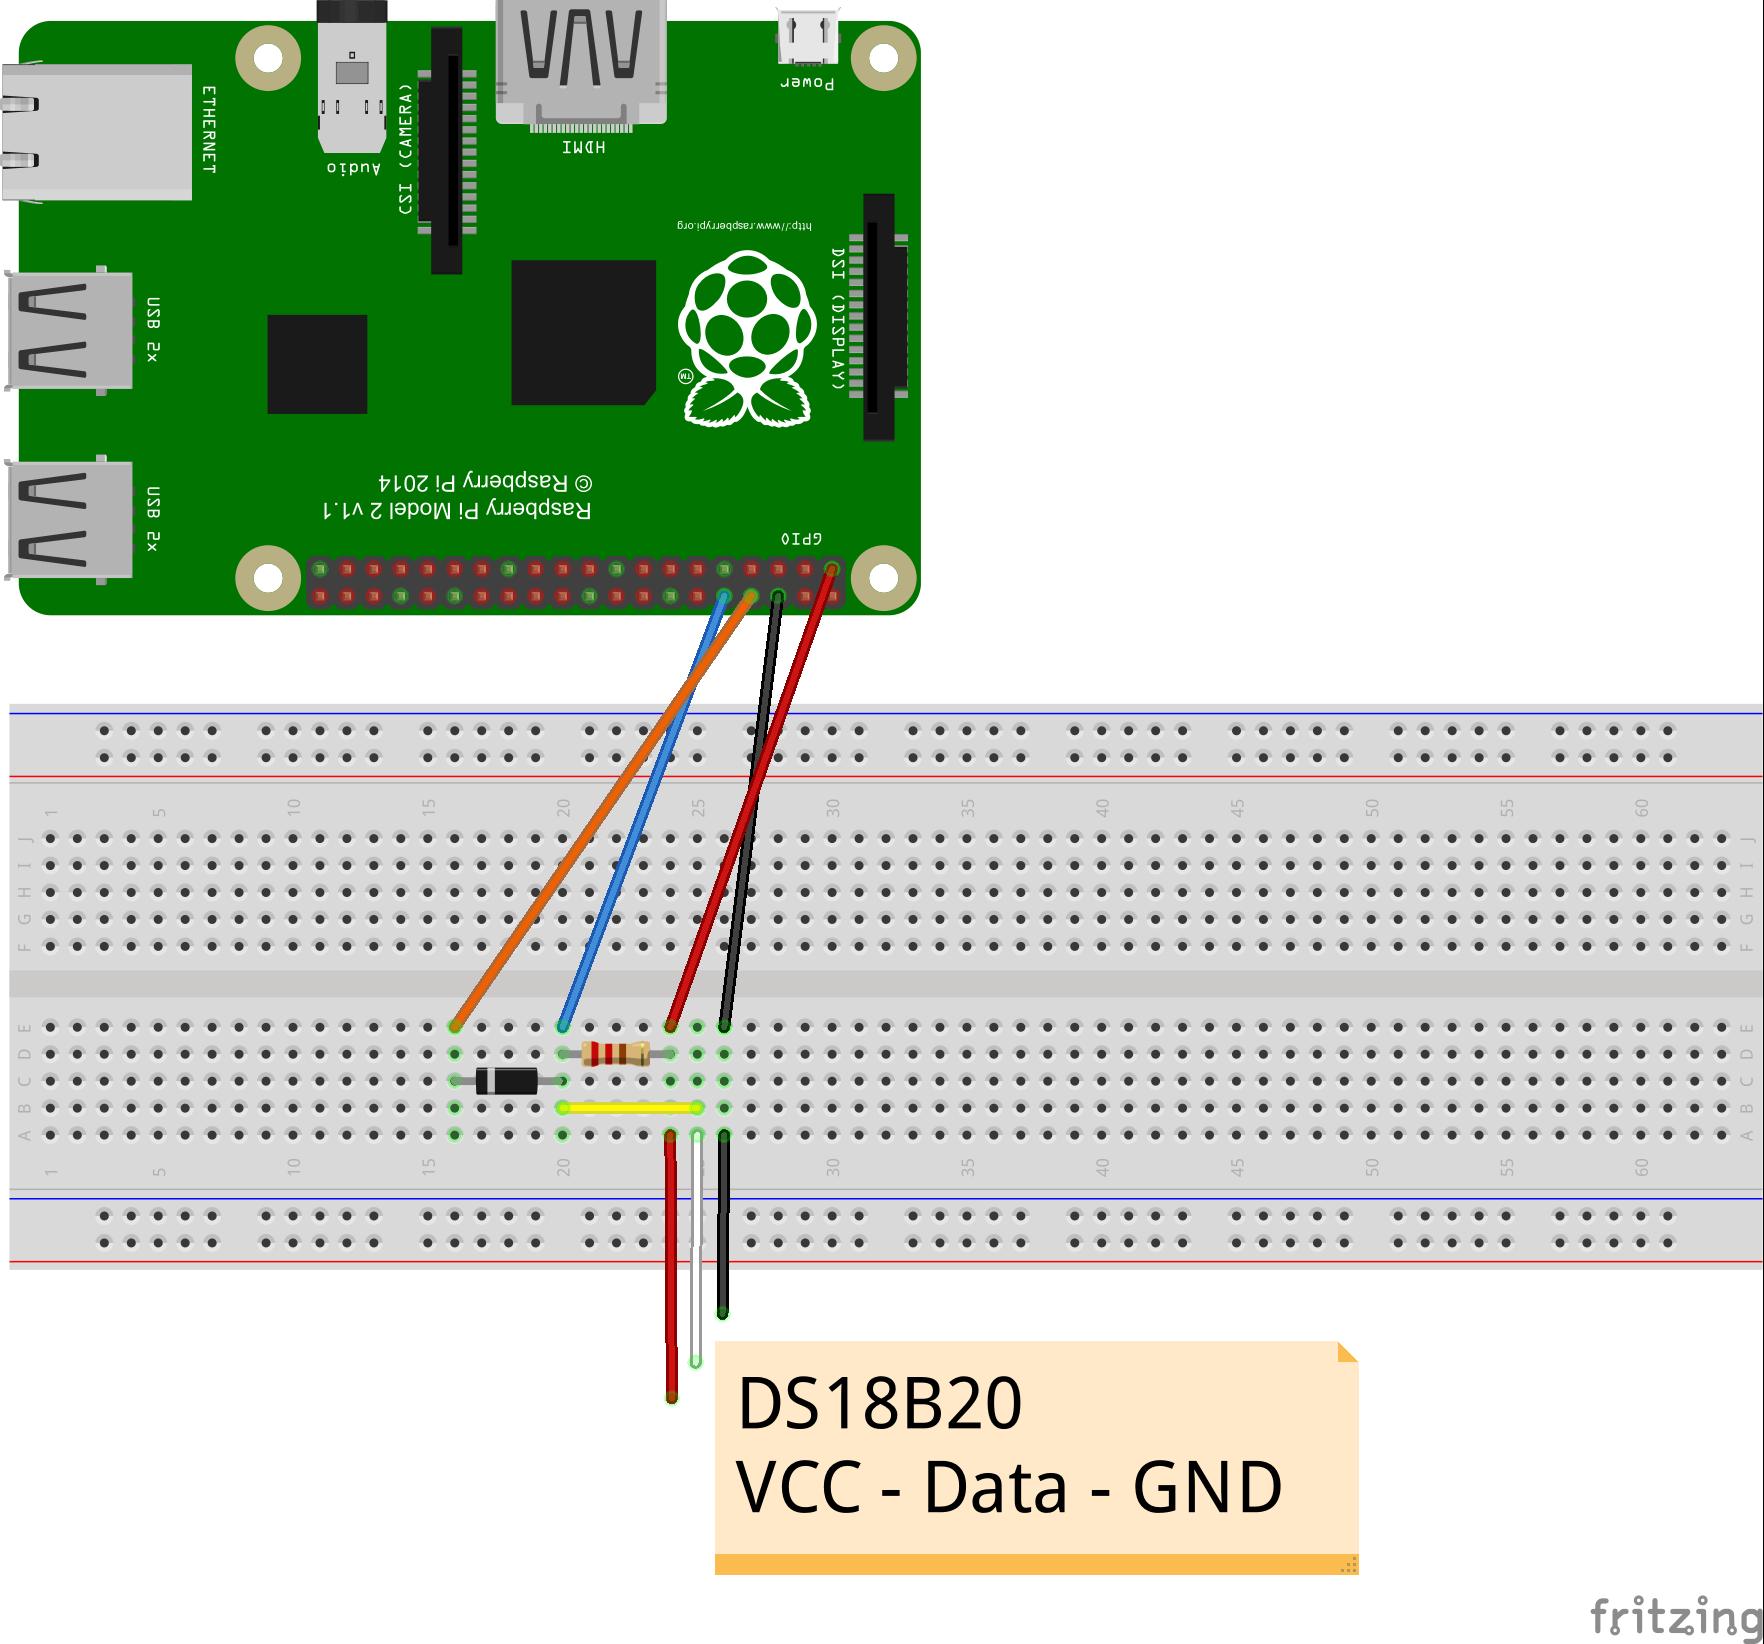 1-Wire DS18B20 Sensor on Windows 10 Iot Core/Raspberry Pi 2 ...